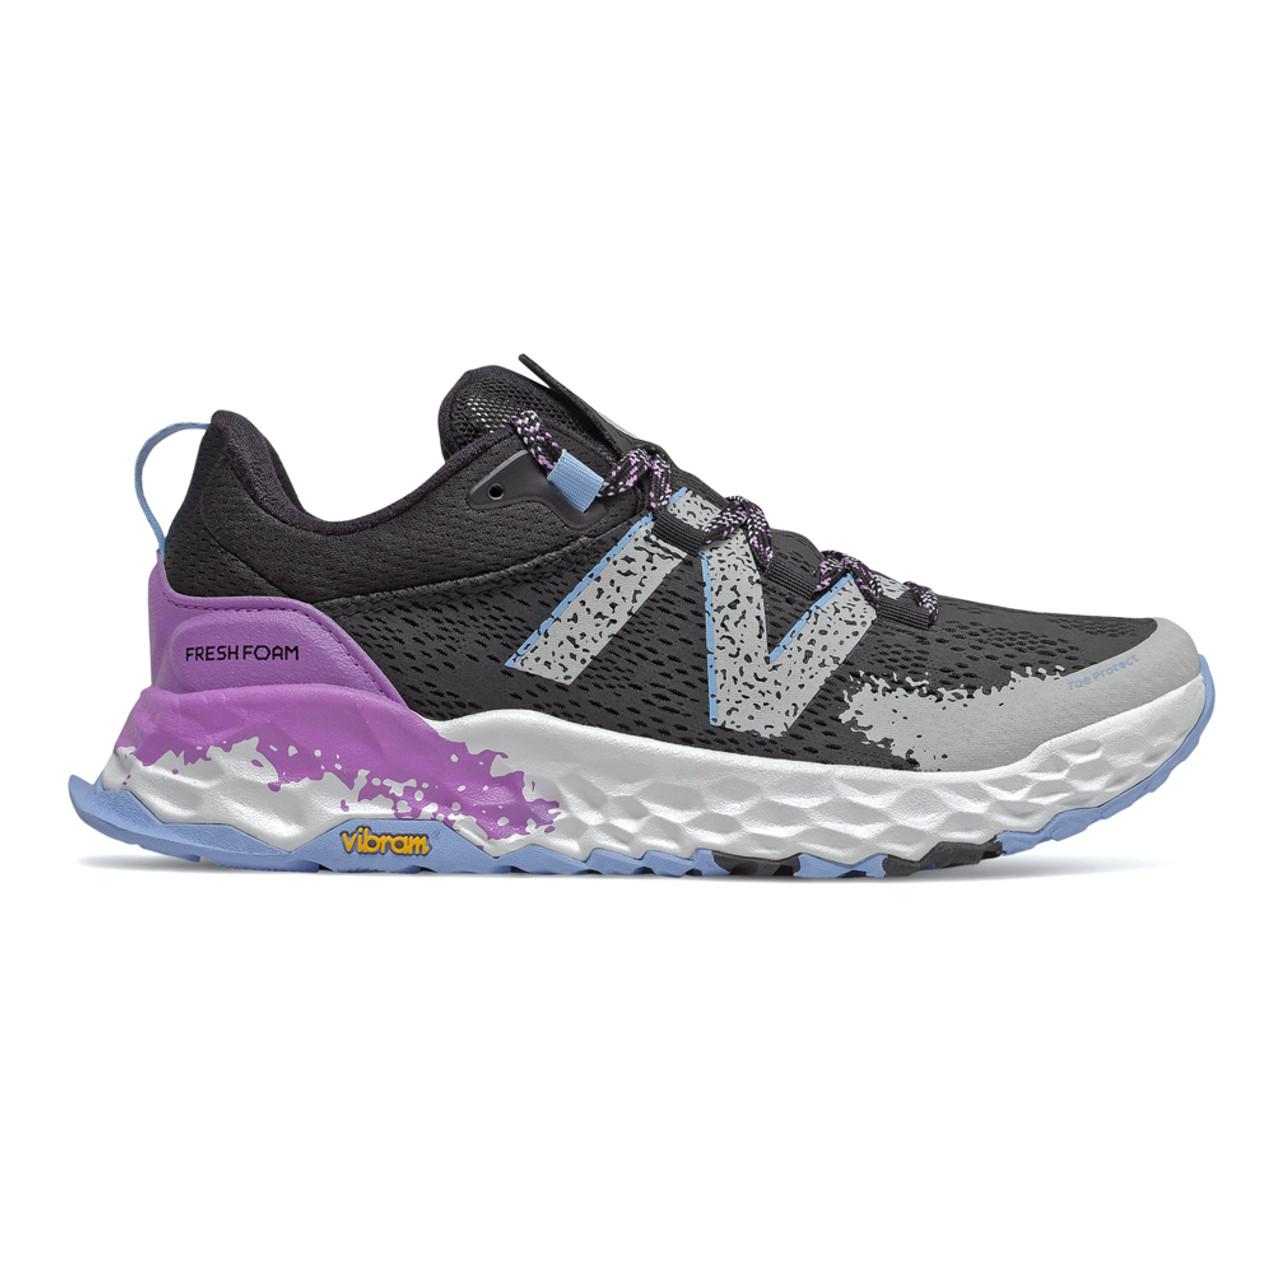 New Balance Women's WTHIERP5 Trail Runner Black/Neo Violet/Fog